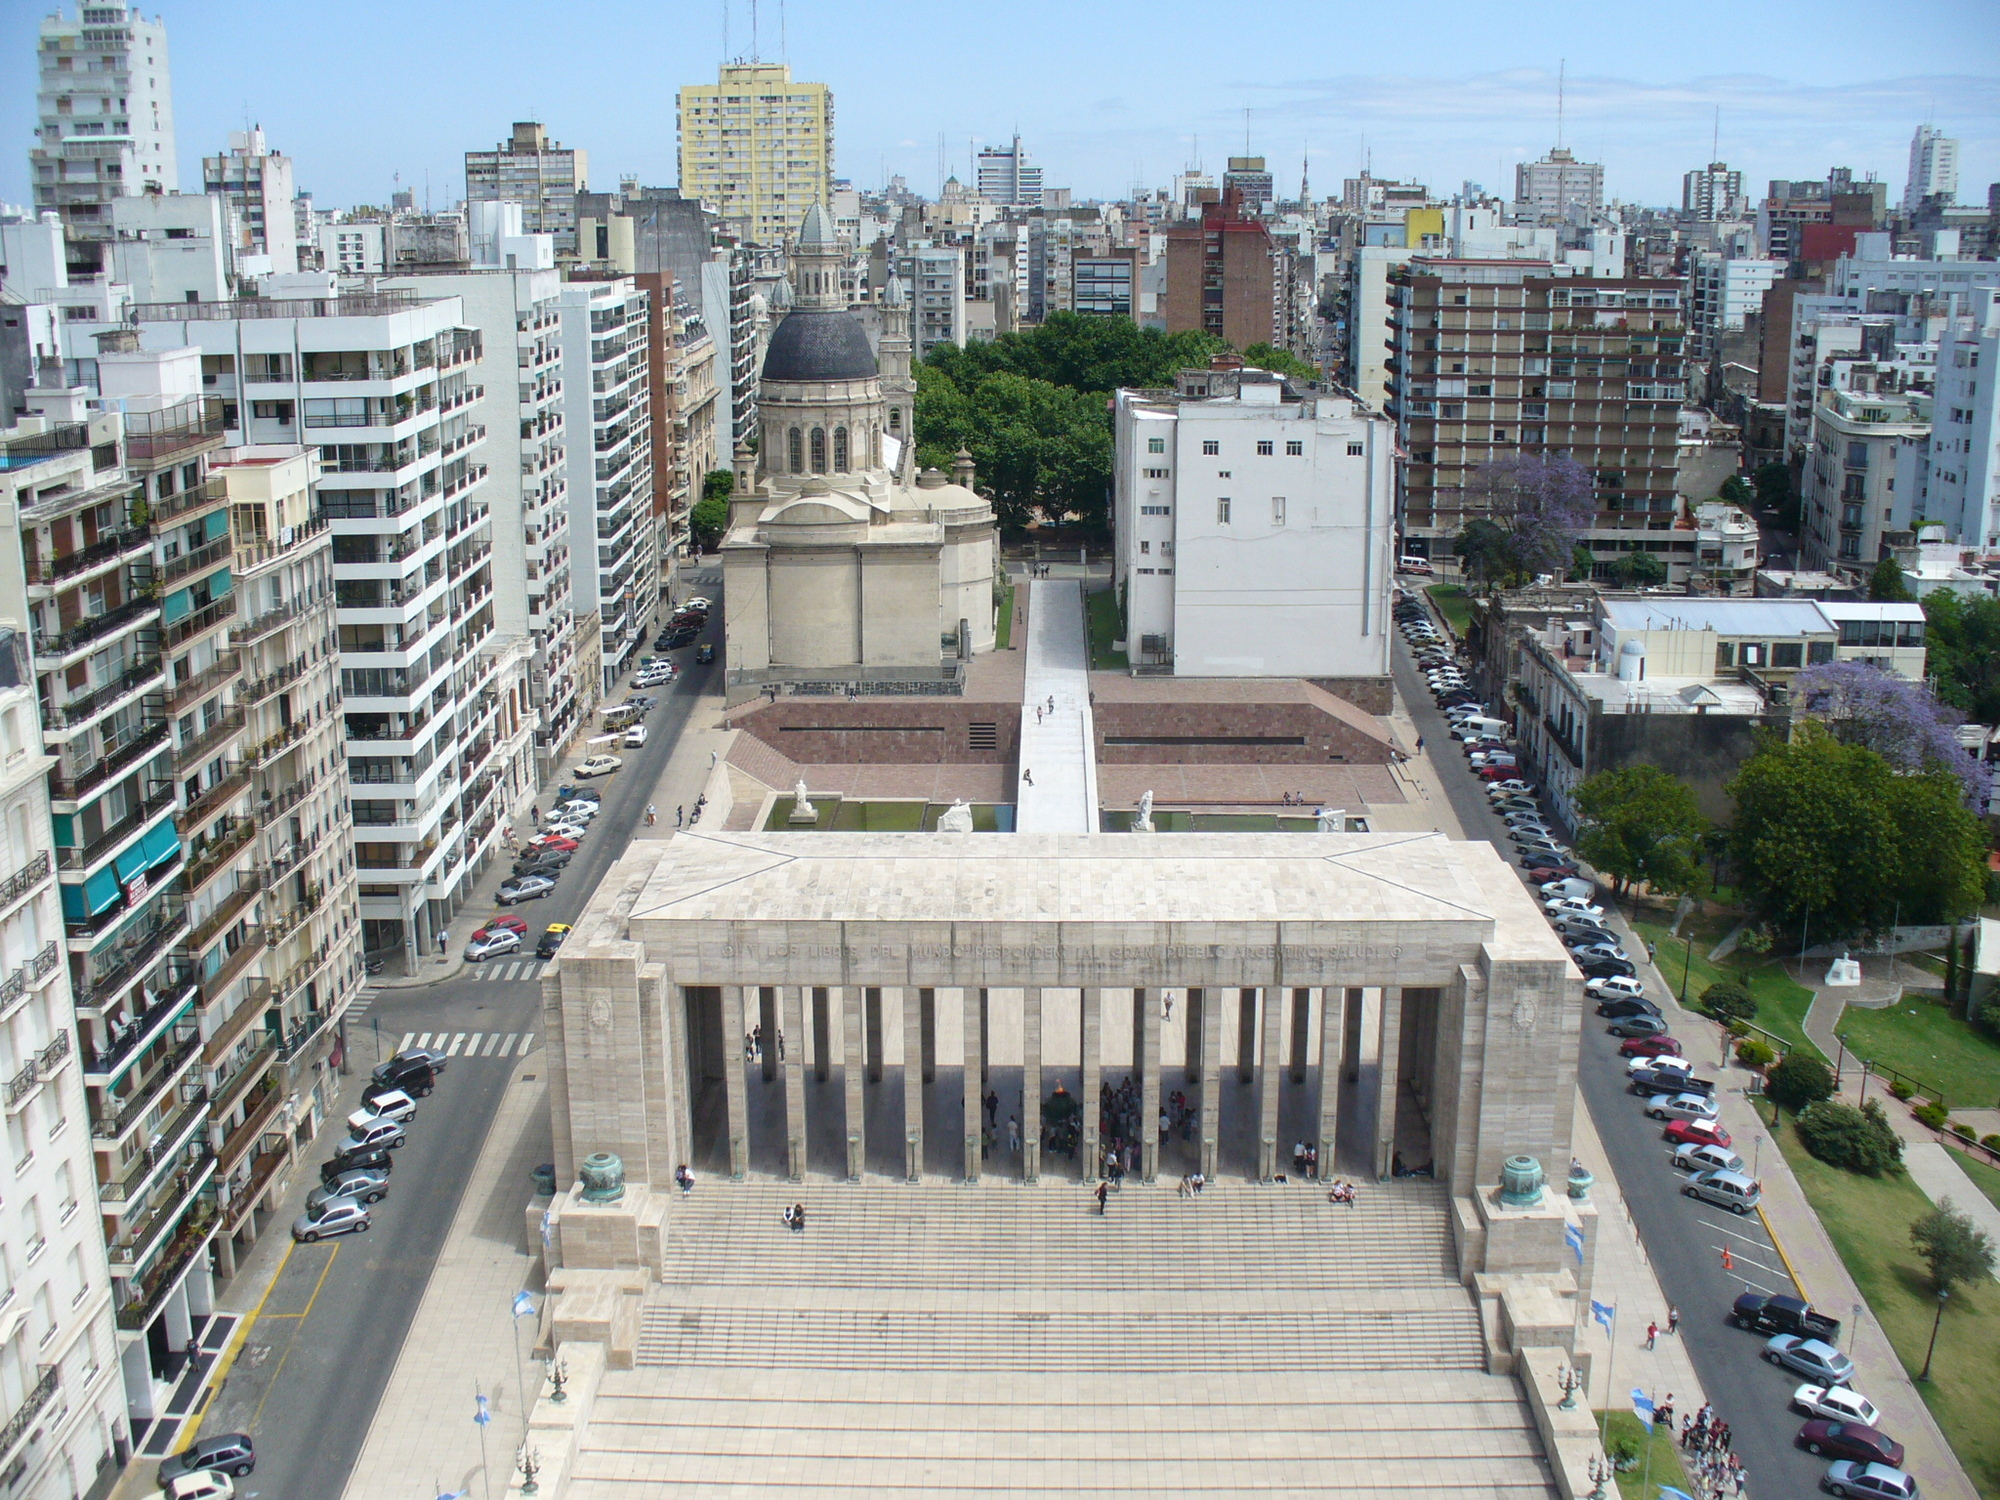 Gu a de arquitectura en rosario 12 sitios que todo for Arquitectura rosario